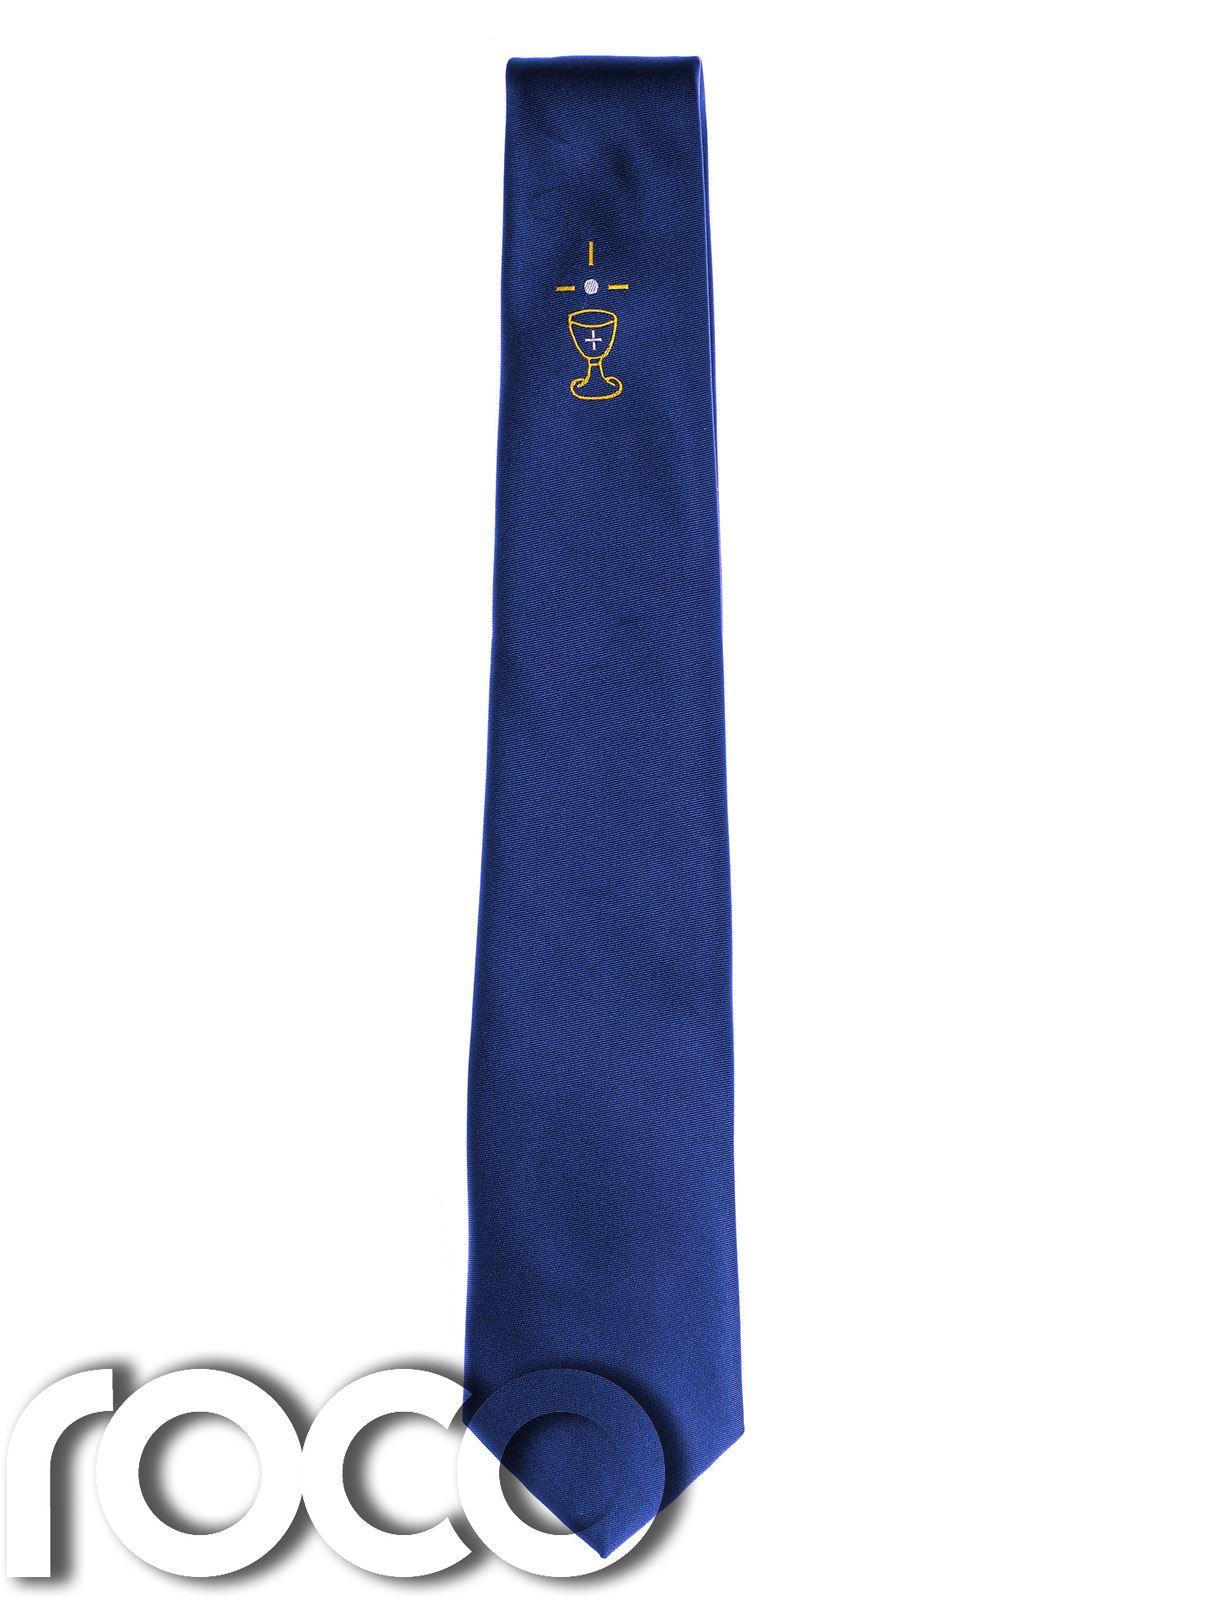 Garcons-Costume-Bleu-Communion-Costume-Bleu-Communion-Costume miniature 9